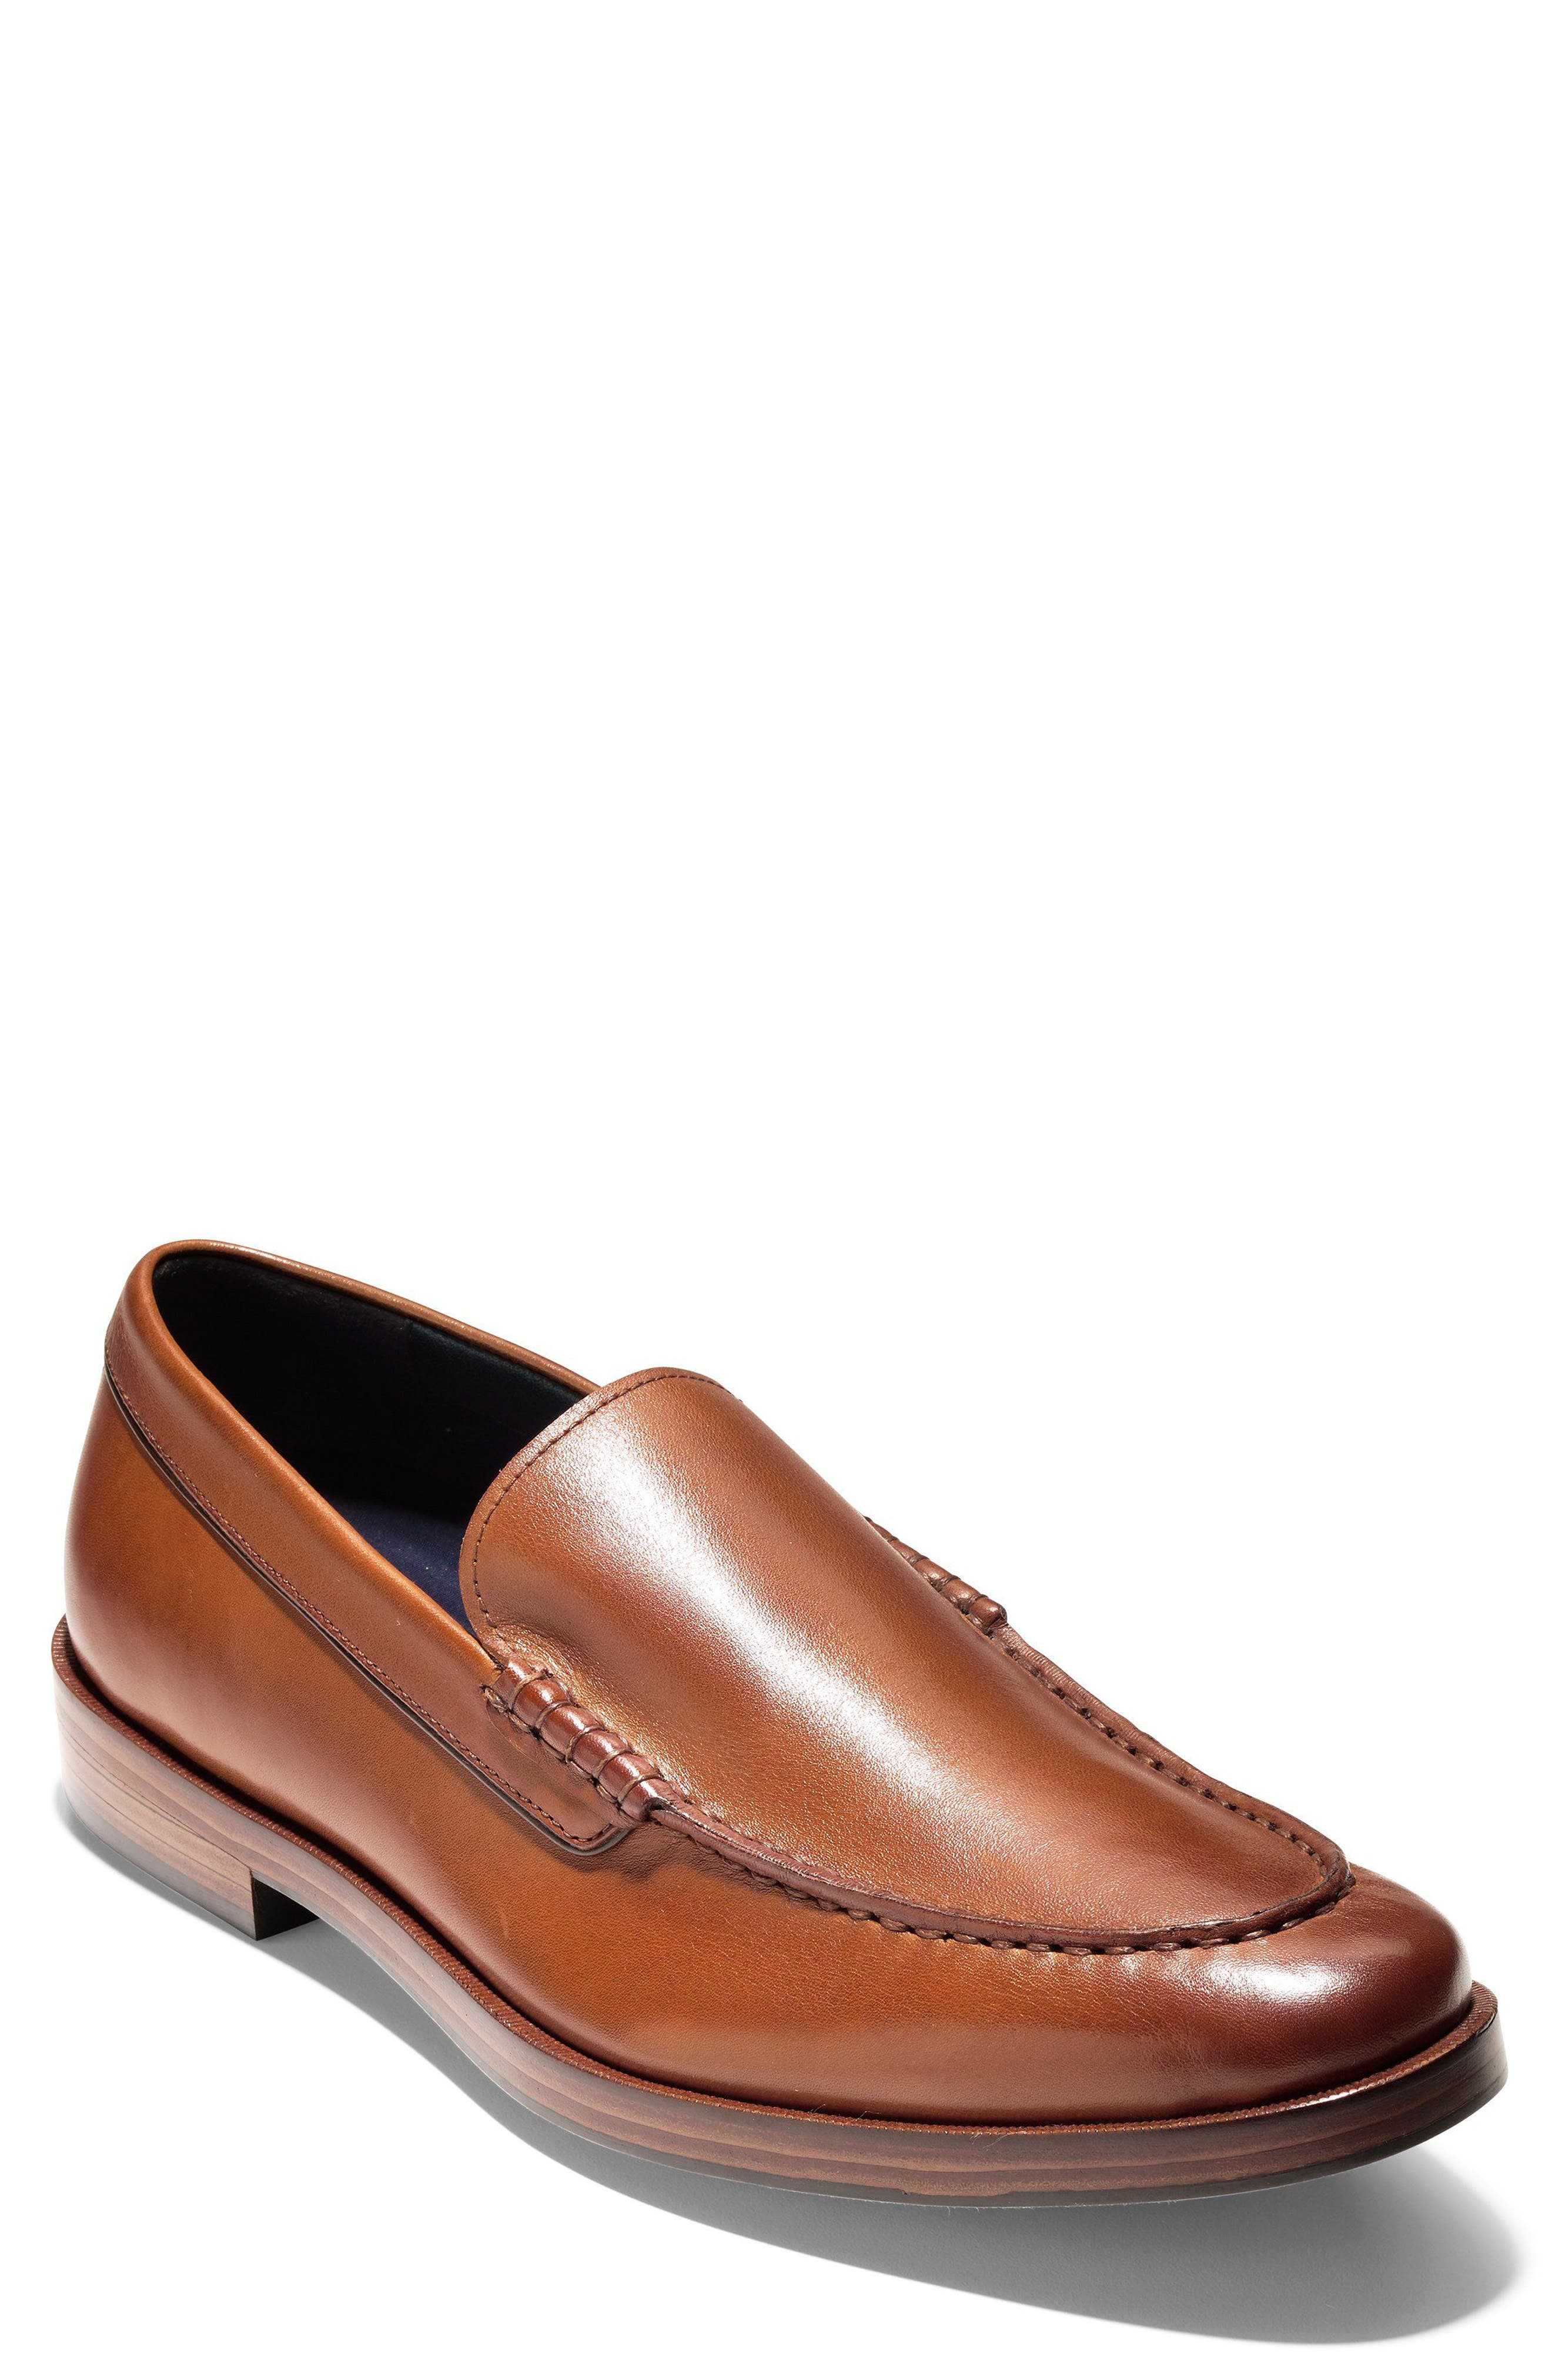 Hamilton Grand Venetian Loafer,                         Main,                         color, British Tan